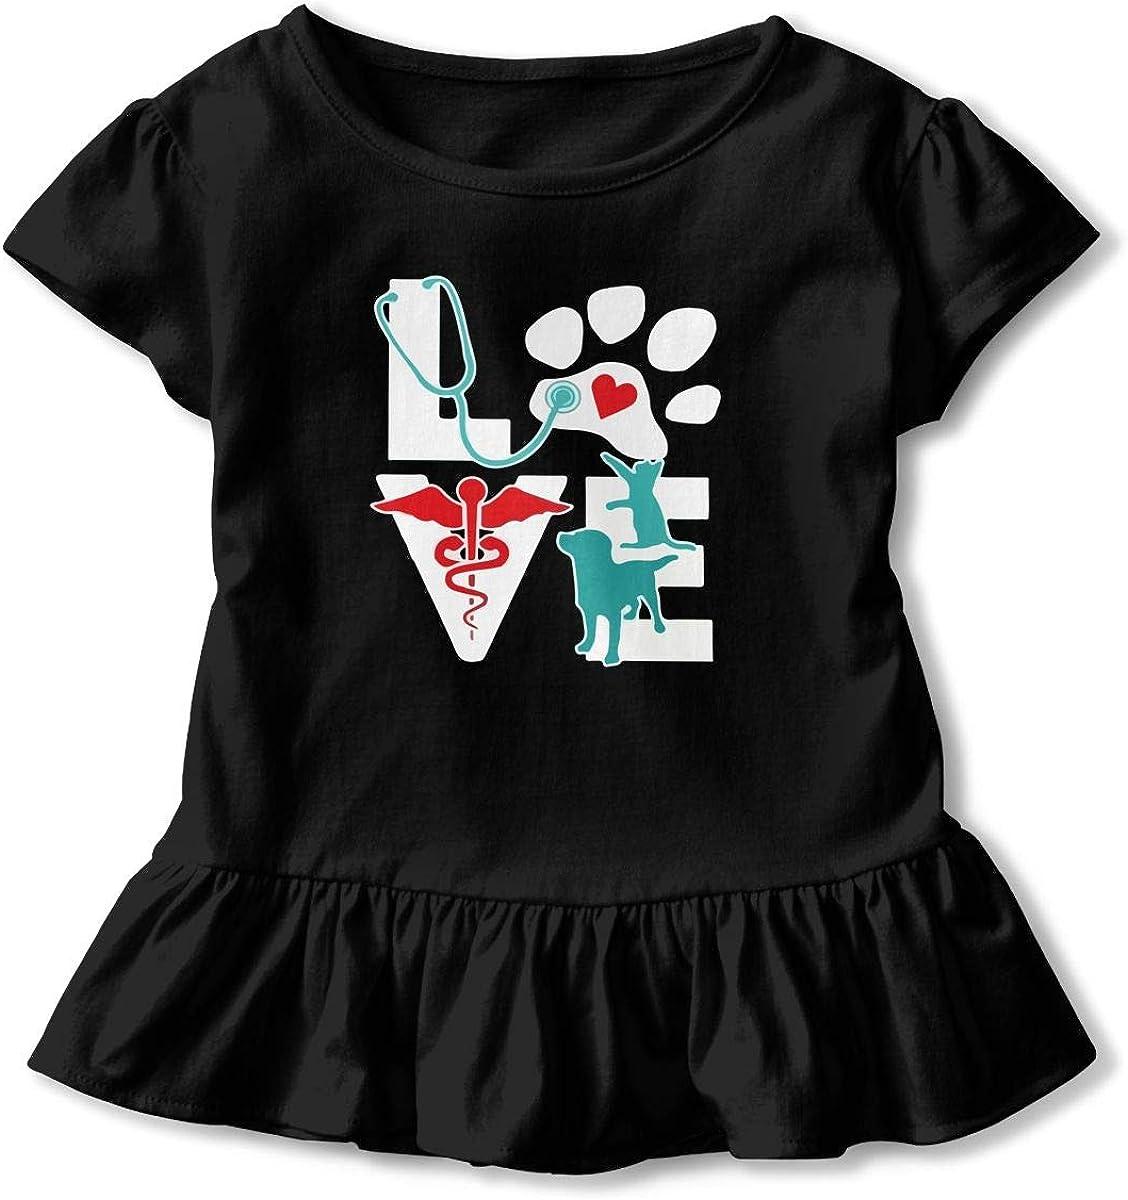 Veterinarian Love Toddler Girls T Shirt Kids Cotton Short Sleeve Ruffle Tee